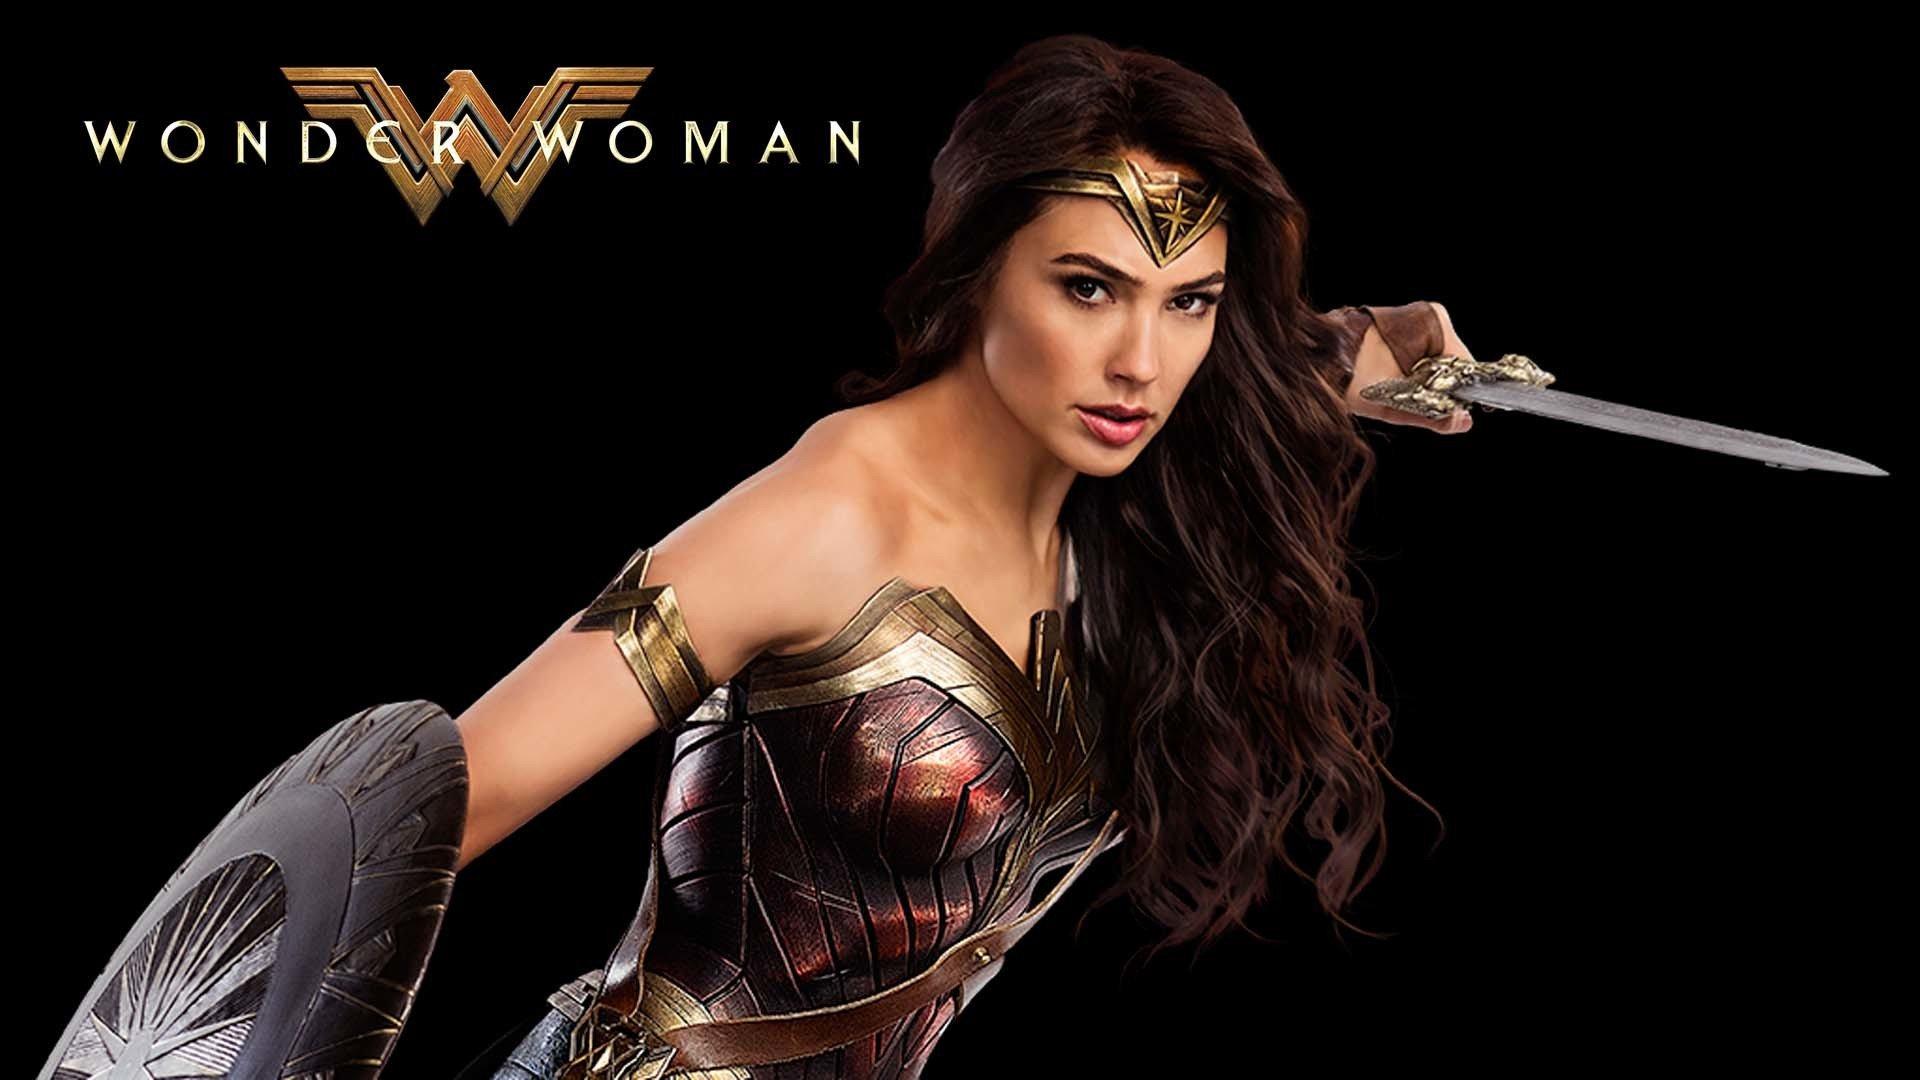 Amazoncom Wonder Woman Bluray Charles Roven Rebecca Steel Roven Stephen Jones Zack Snyder Deborah Snyder Wesley Coller Richard Suckle Geoff Johns Patty